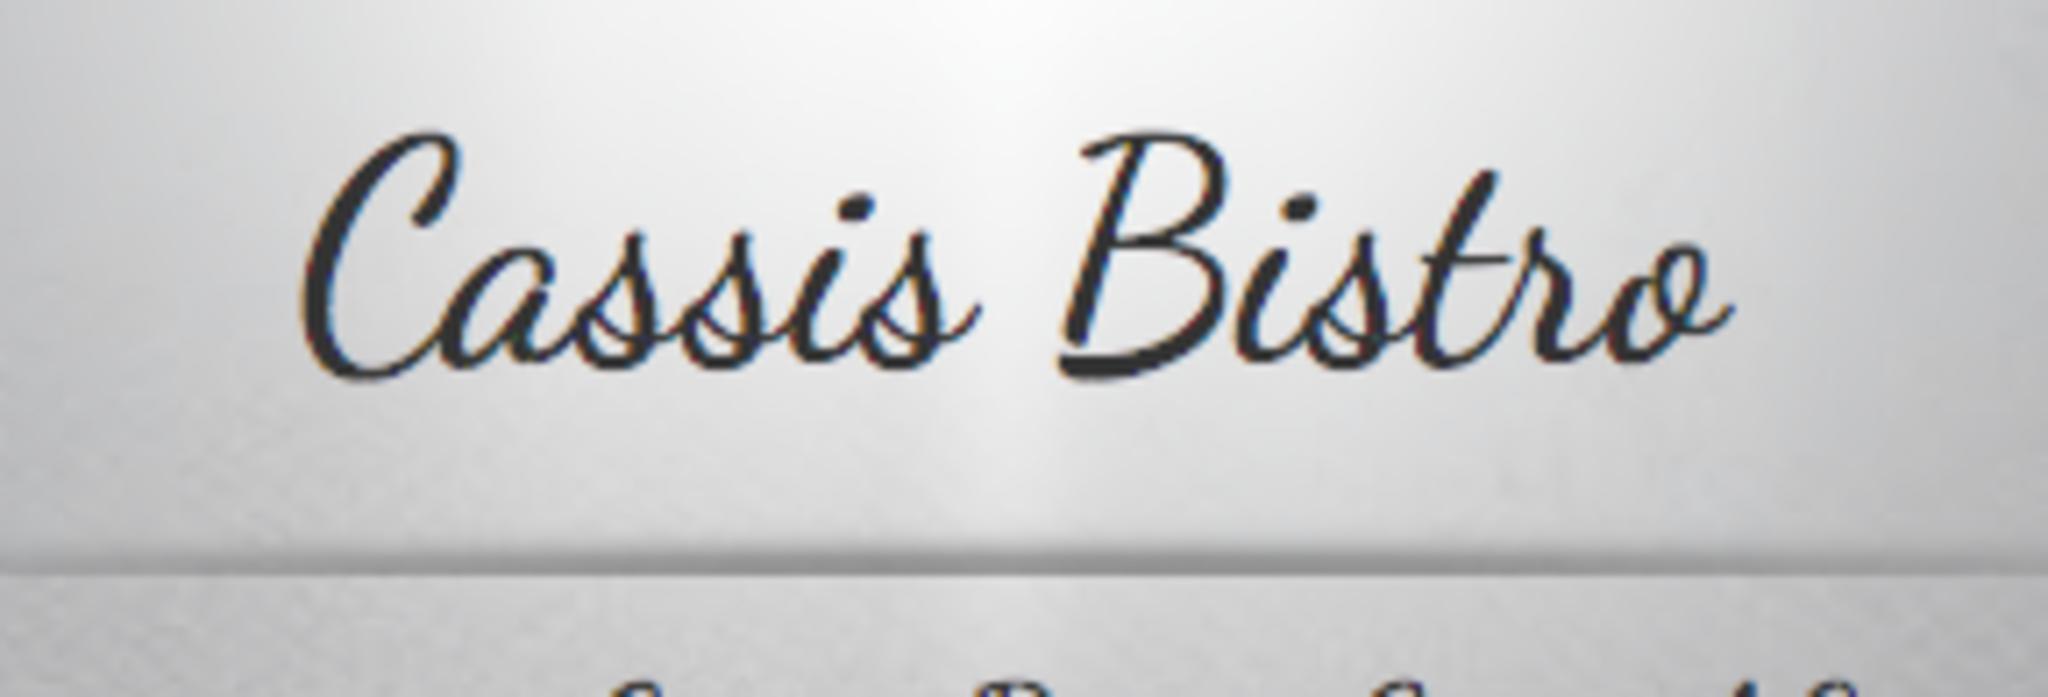 Cassis Bistro